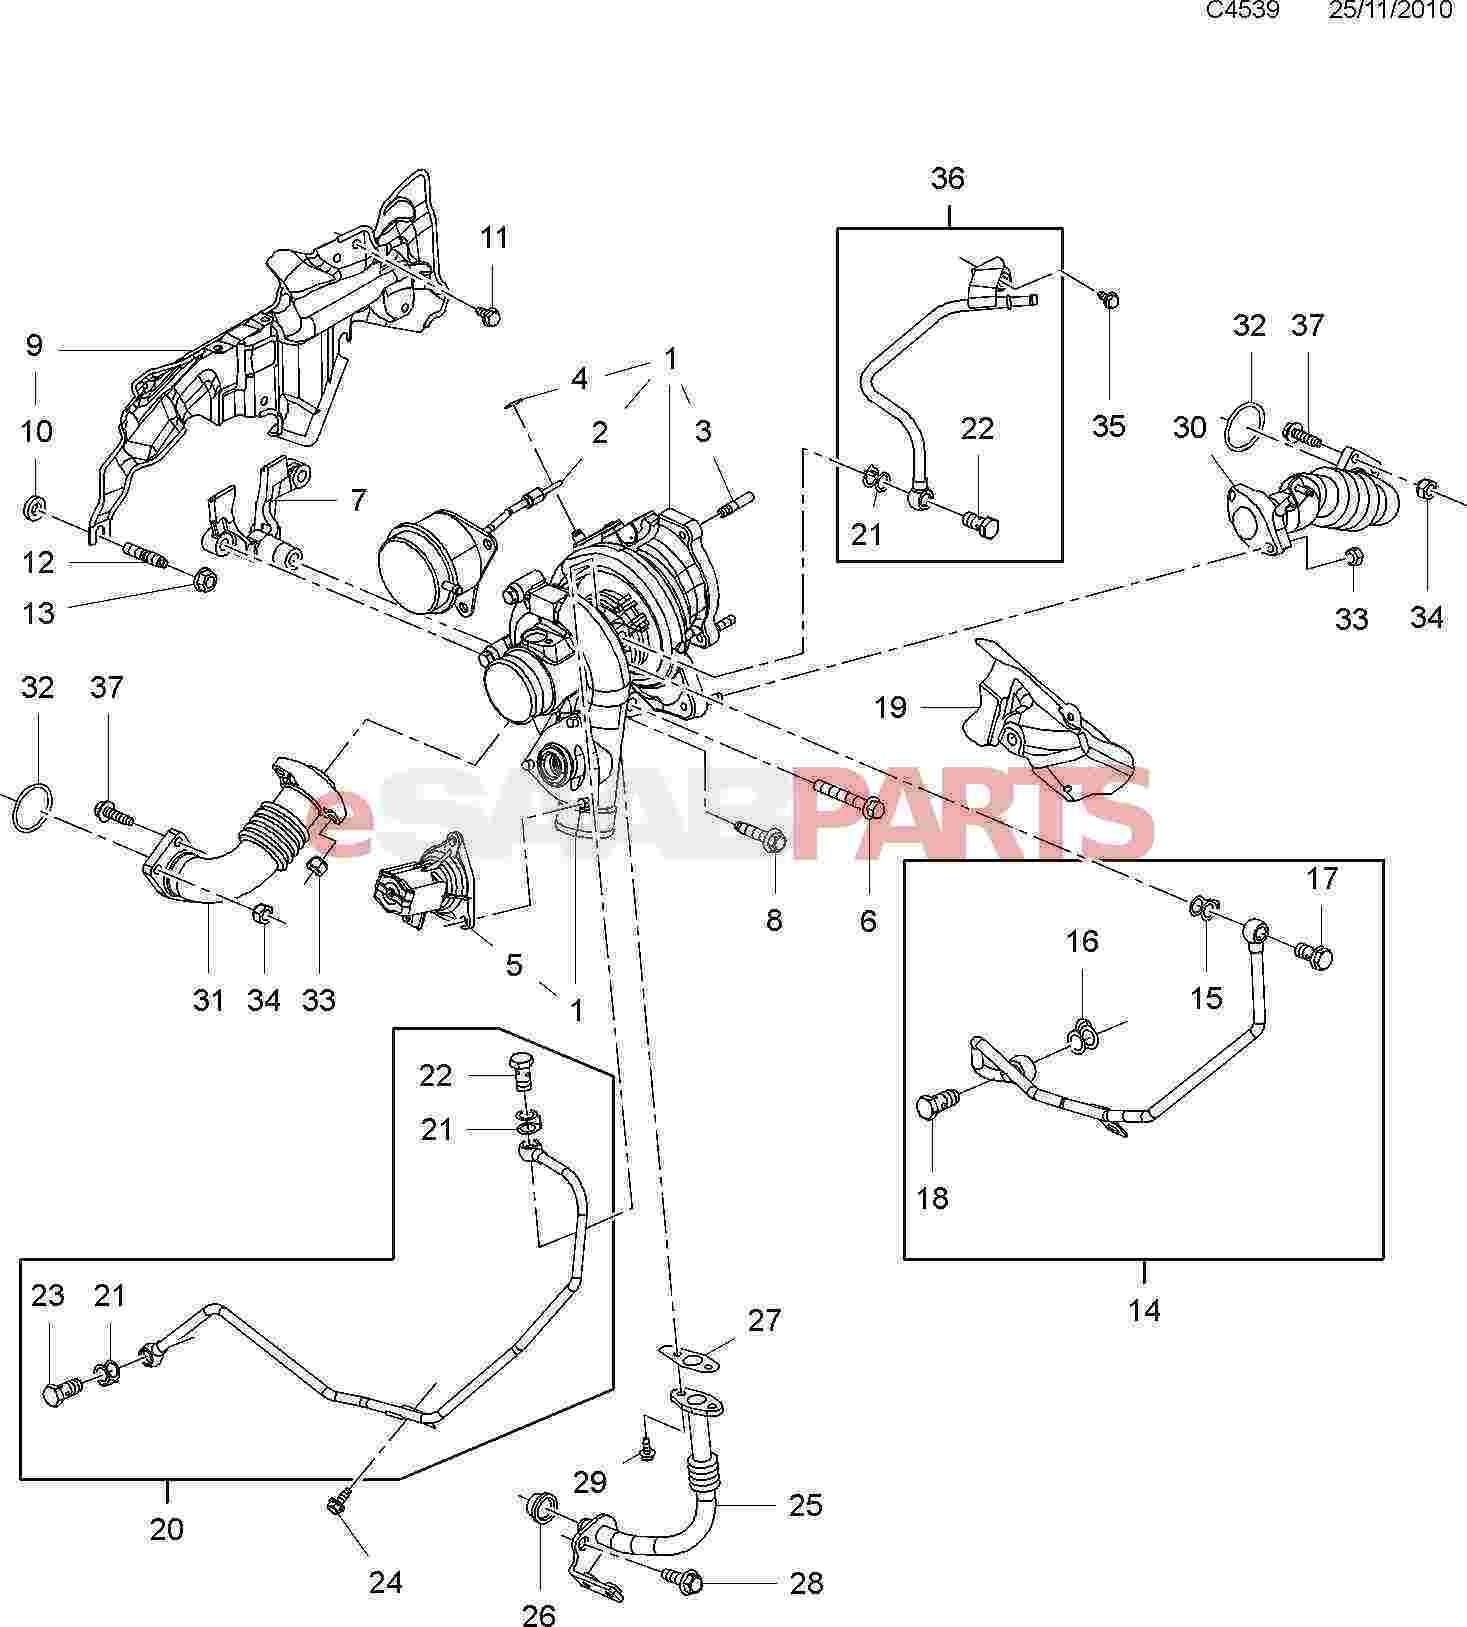 Saab 900 Engine Diagram Saab 9 5 Engine Diagram 2 2 ] Saab Nut Hfh 10—1 5 Thd 9 8 Thk 21 8 Of Saab 900 Engine Diagram